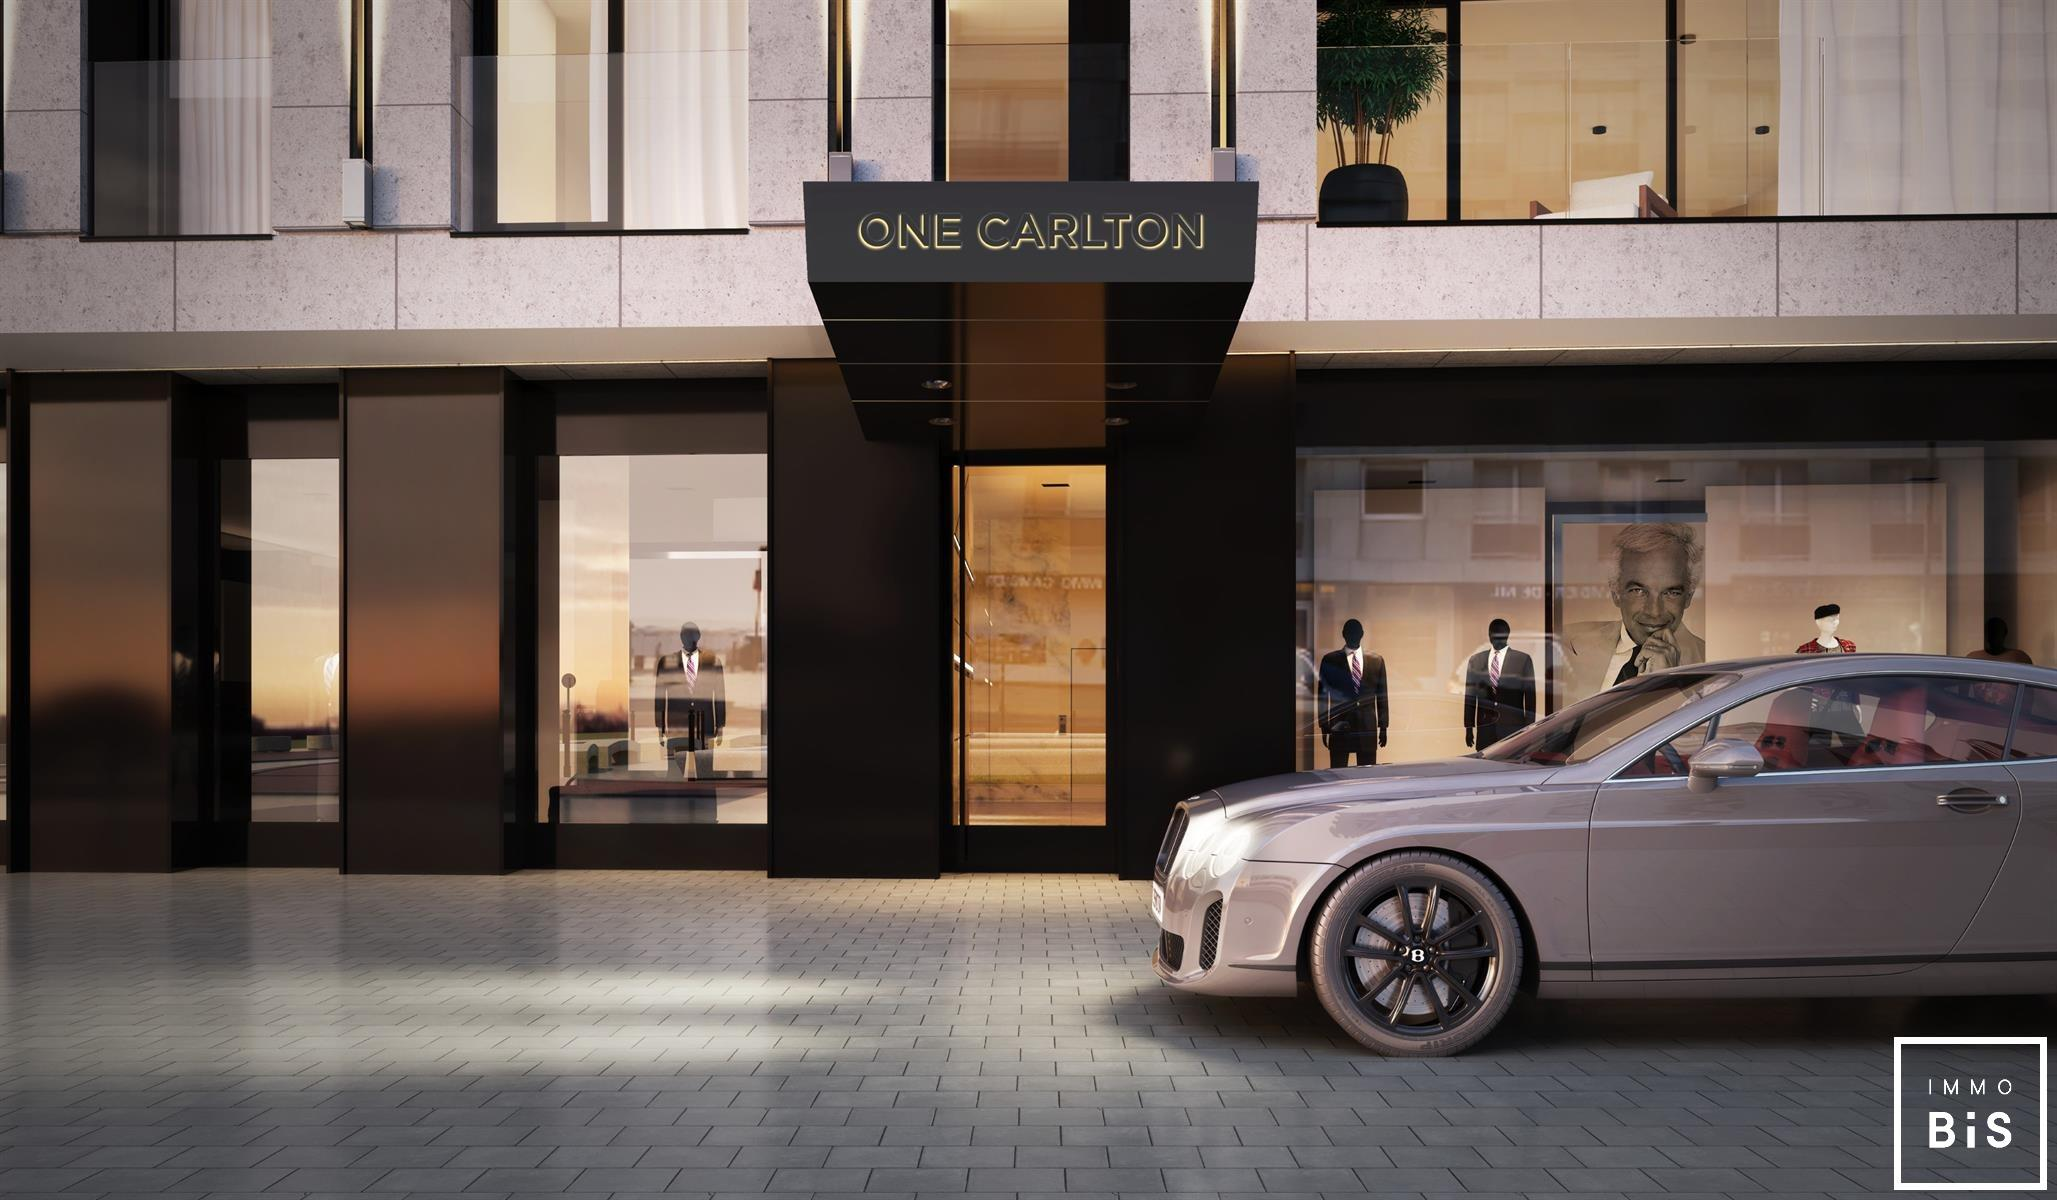 One Carlton 9